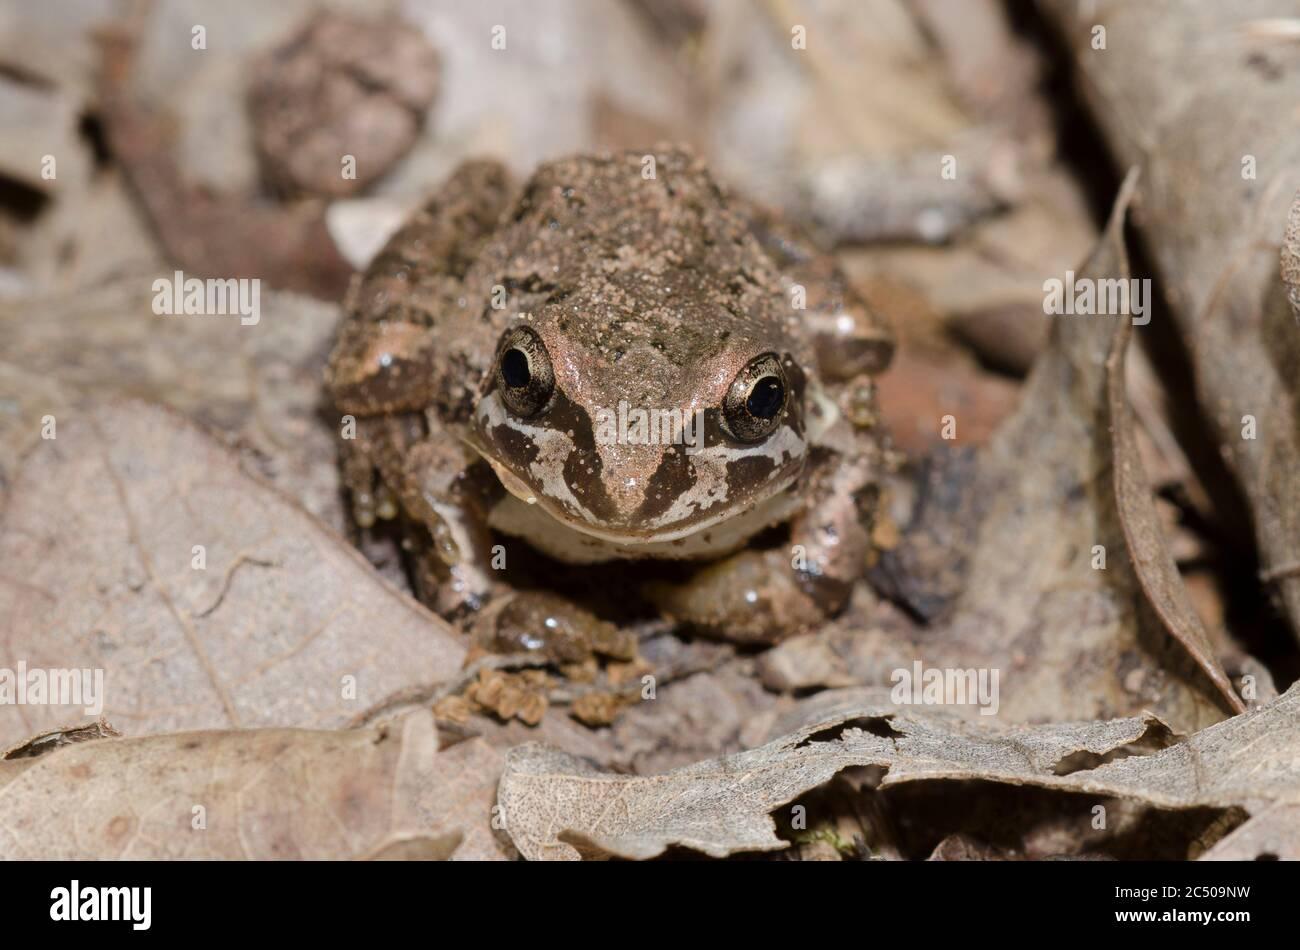 Strecker's Chorus Frog, Pseudacris streckeri, in leaf litter on forest floor Stock Photo